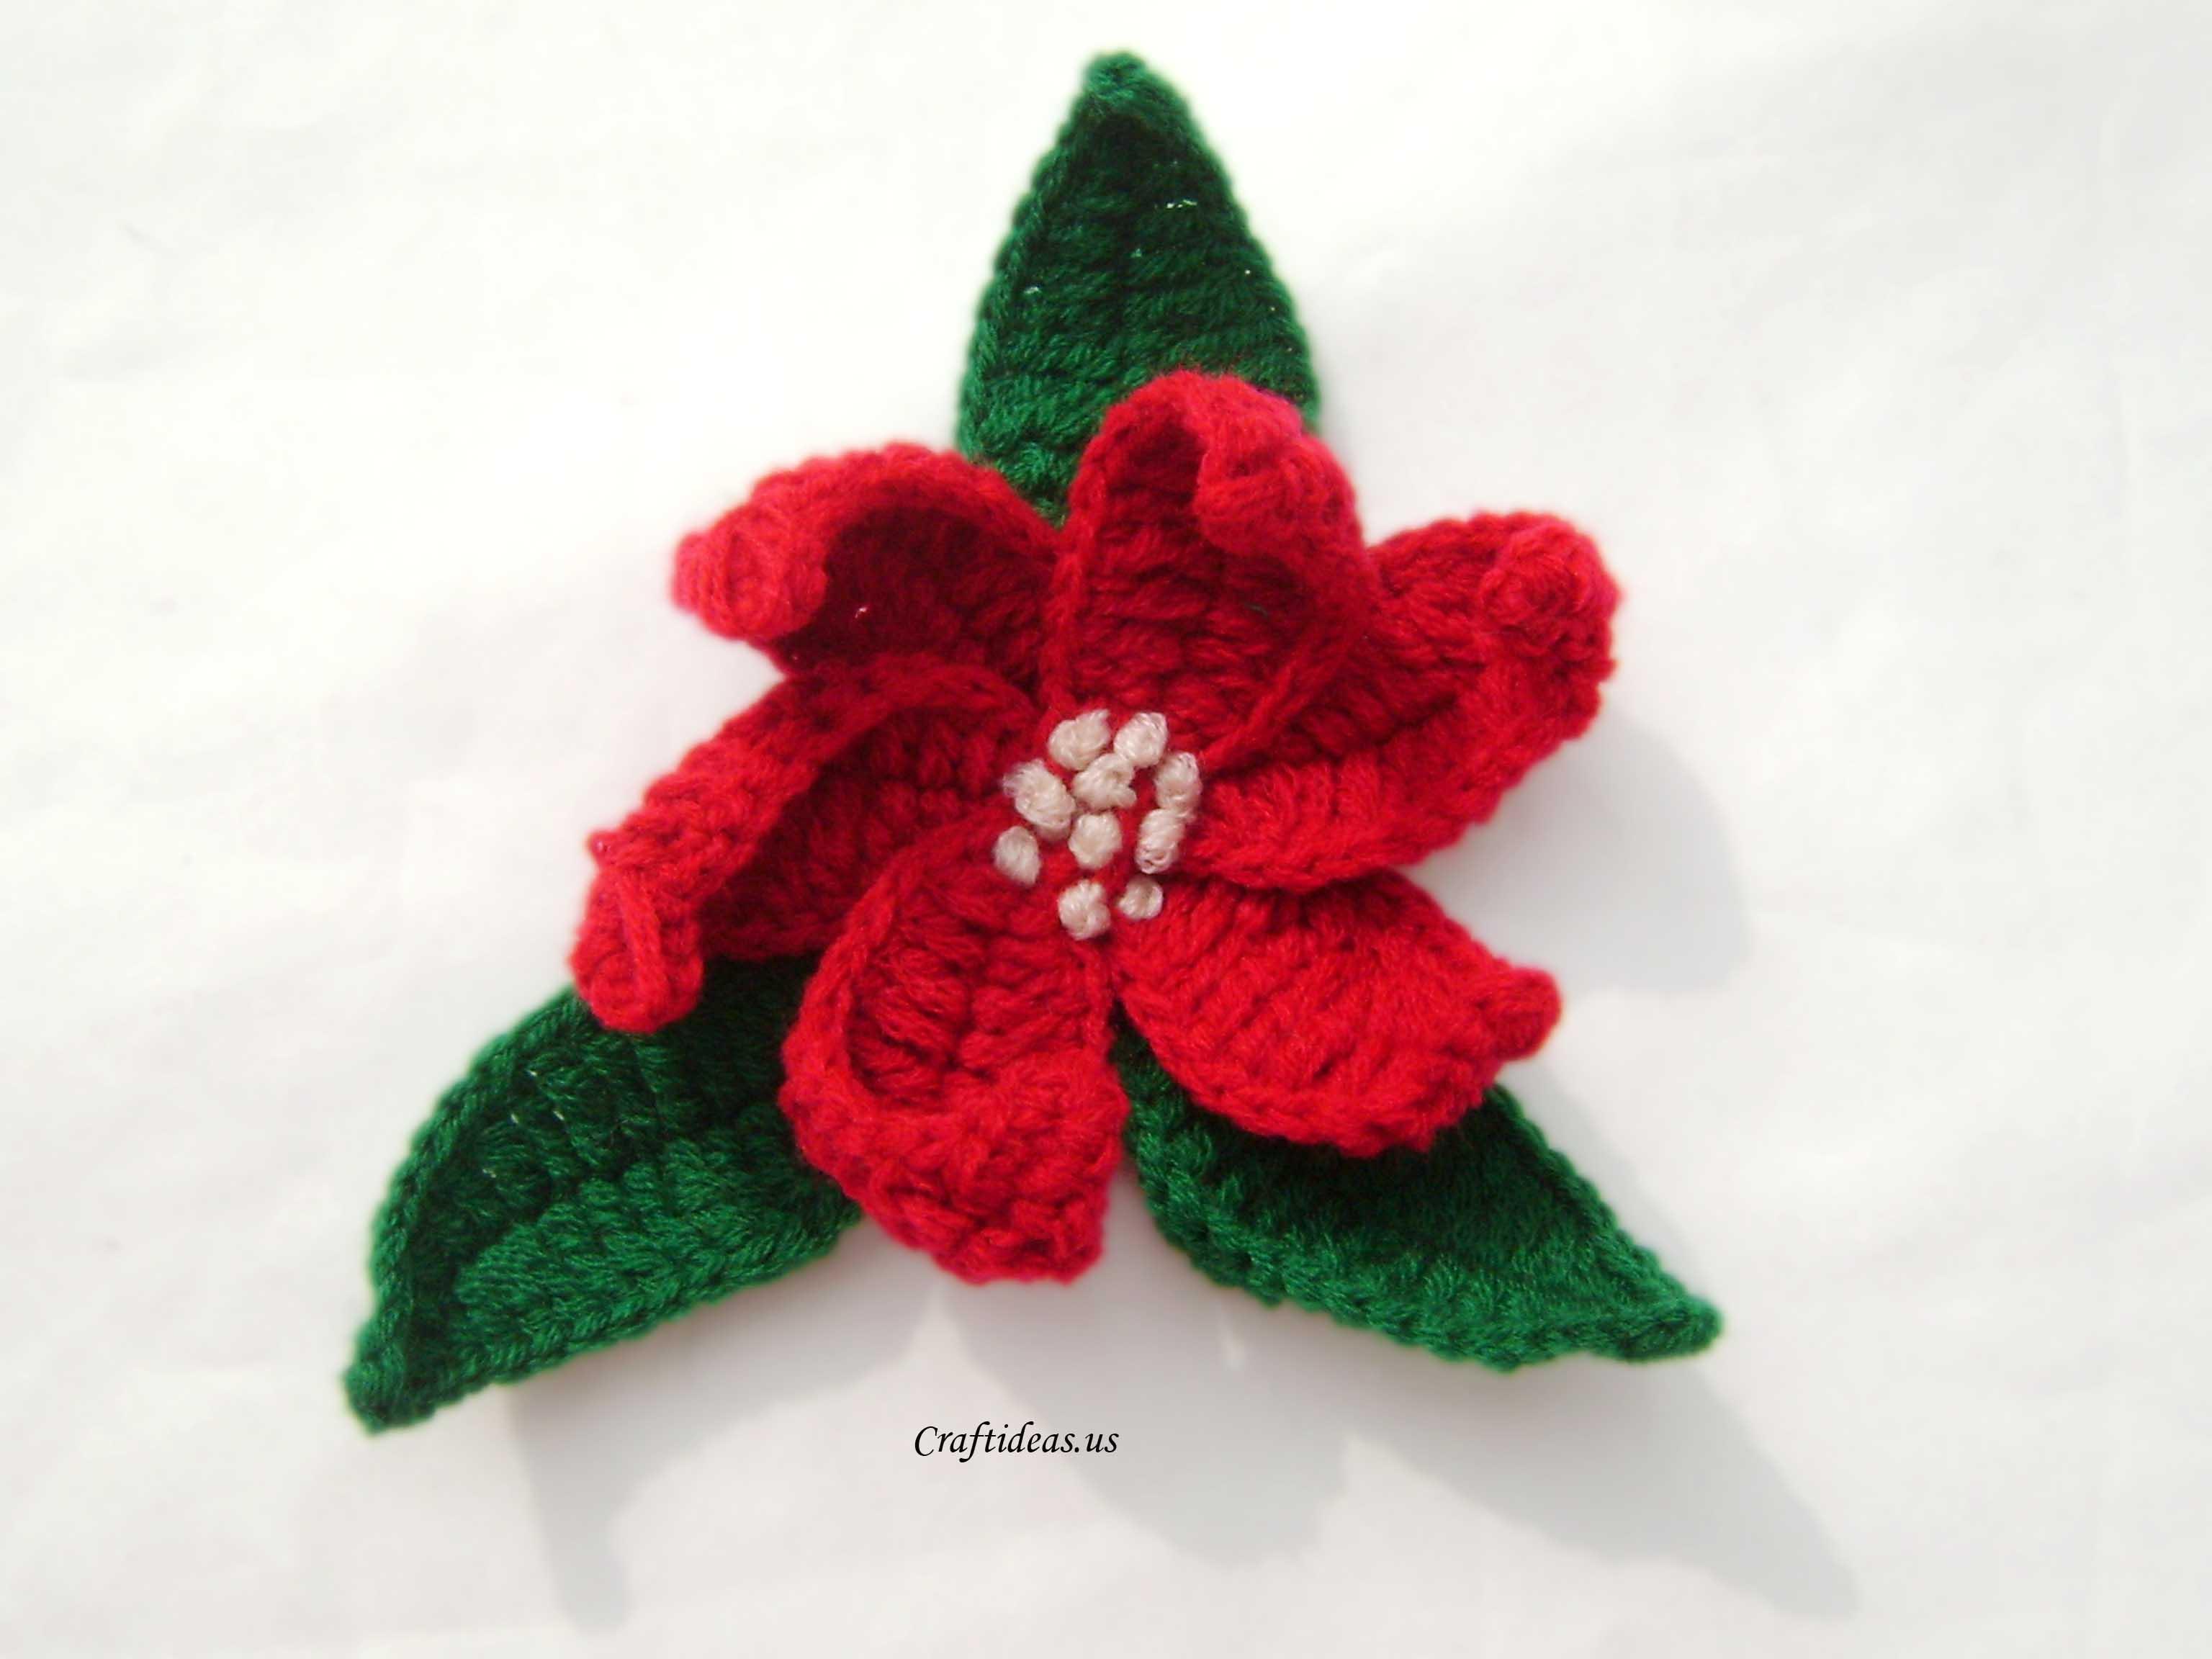 Christmas craft ideas: Crochet Poinsettias - Craft Ideas